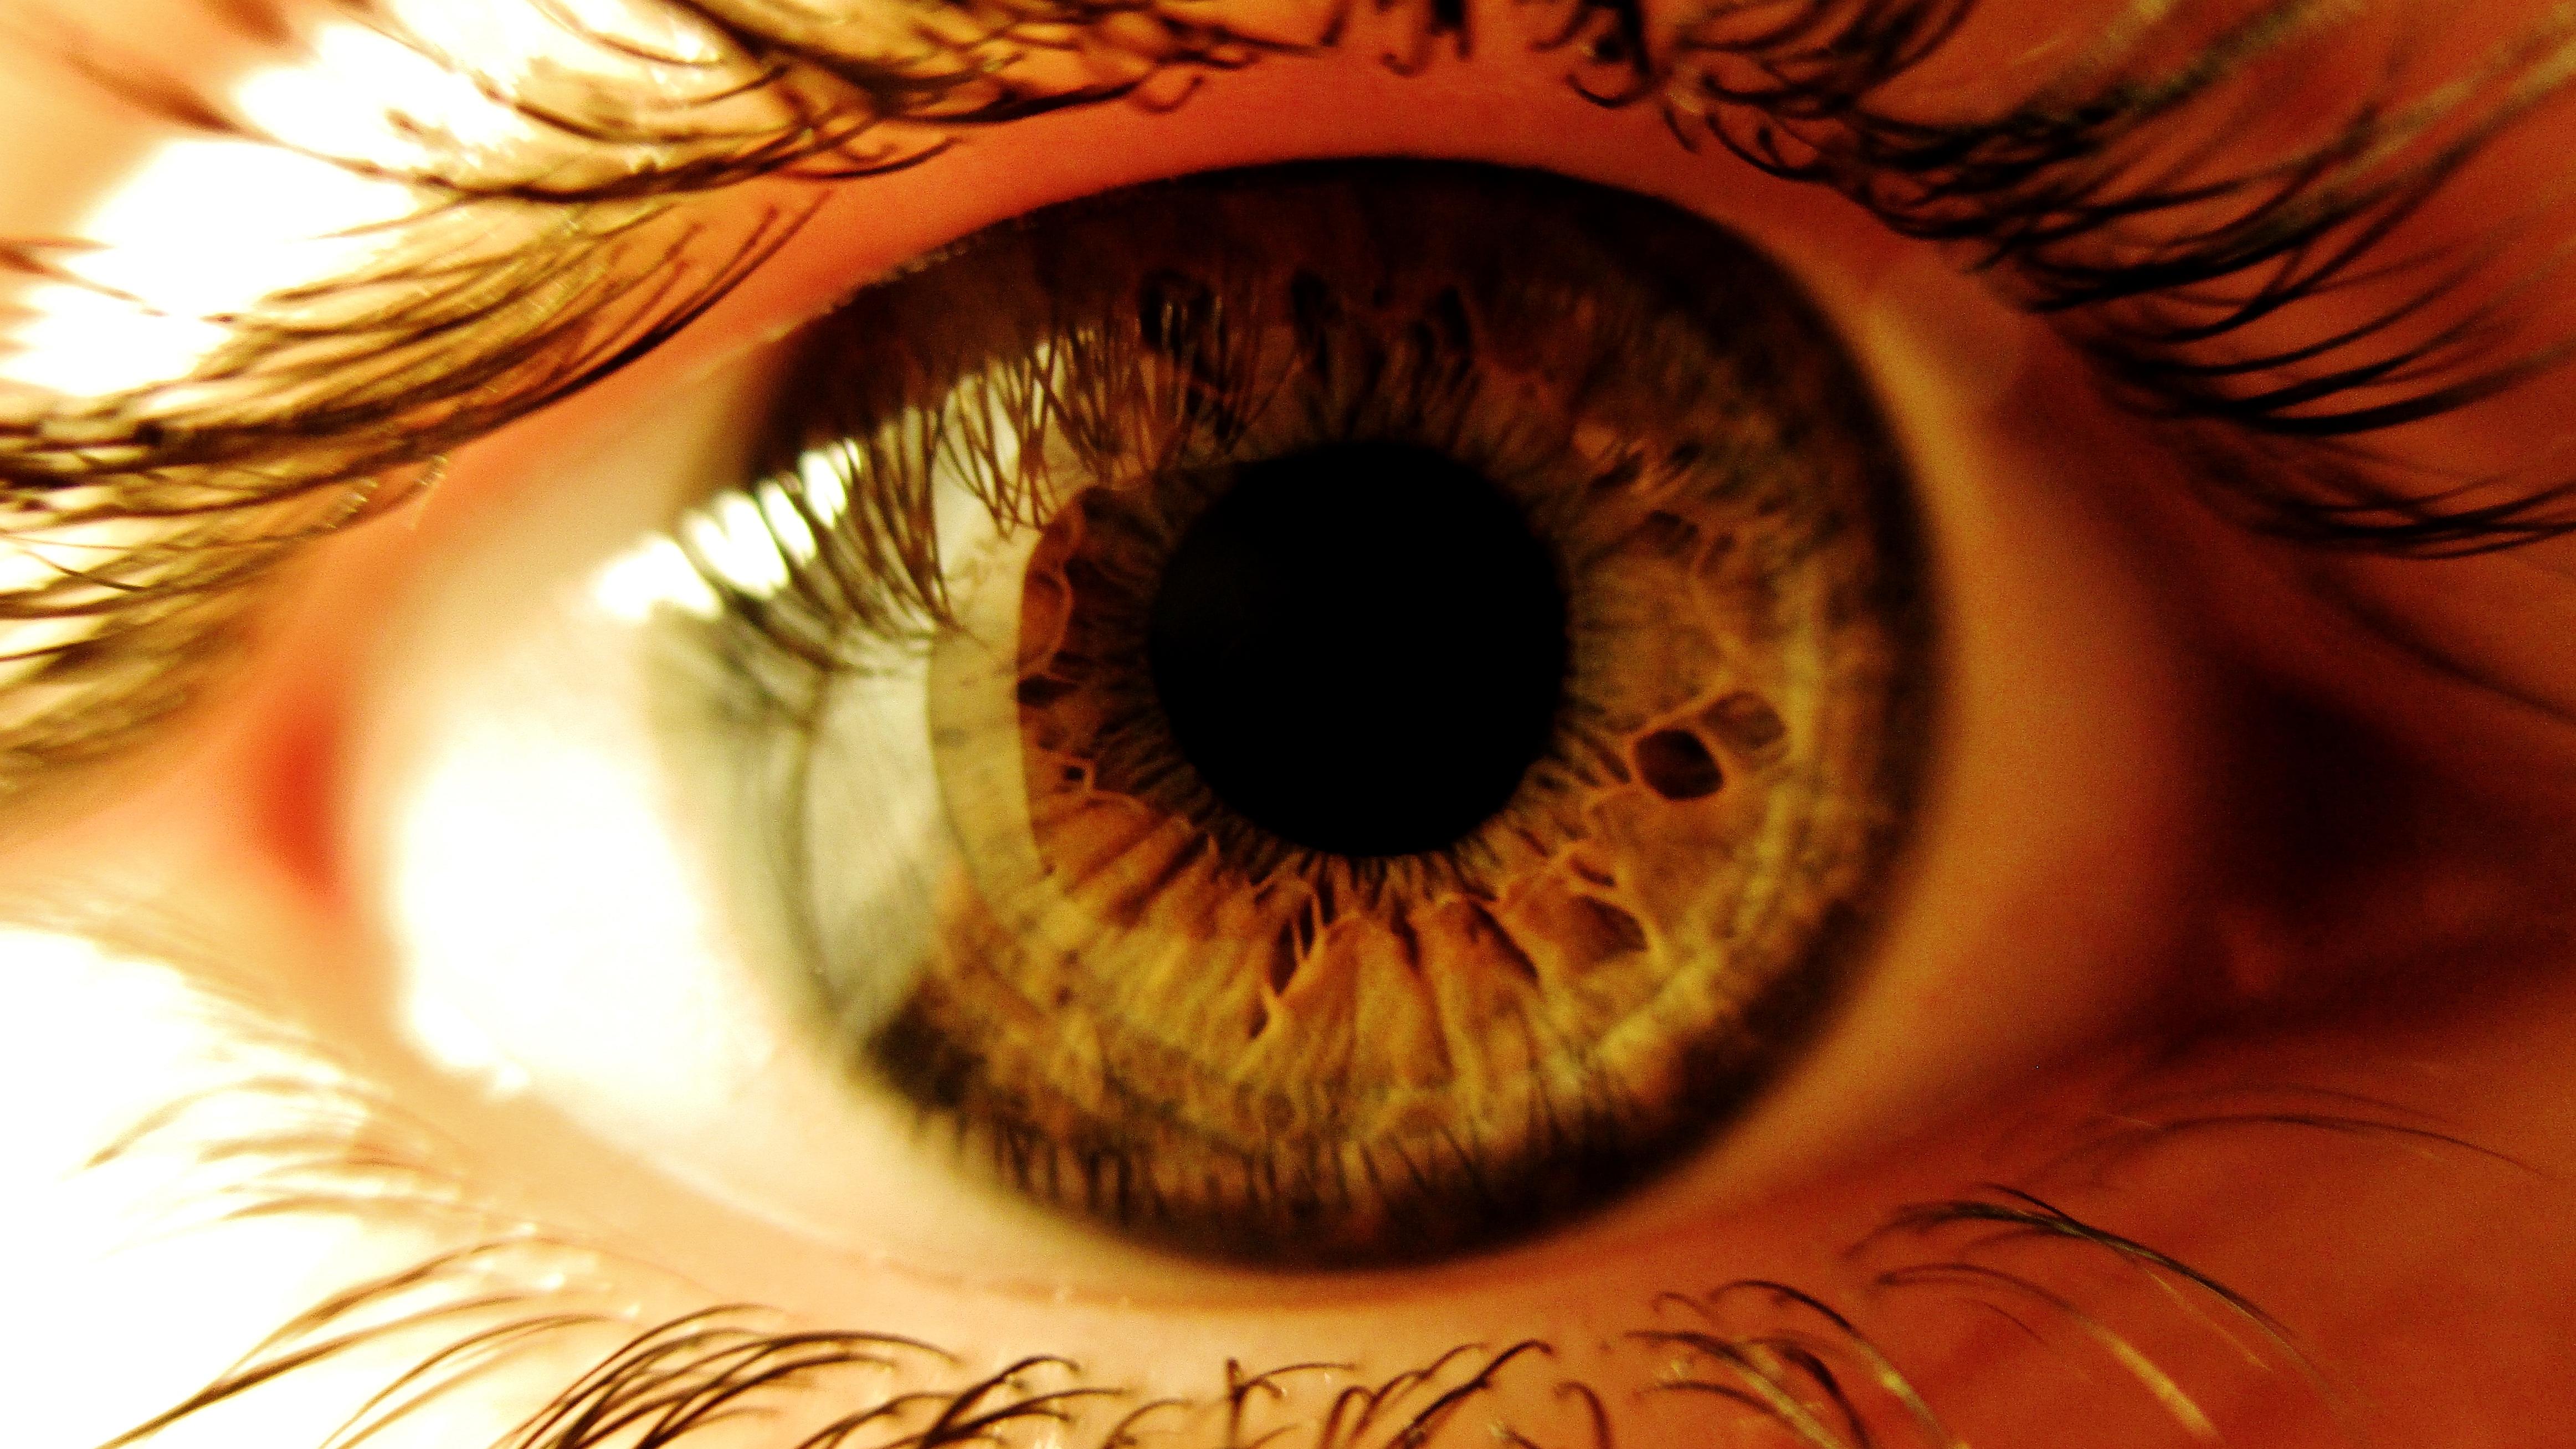 Eye 4k Ultra Hd Wallpaper Background Image 4650x2616 Id 555001 Wallpaper Abyss